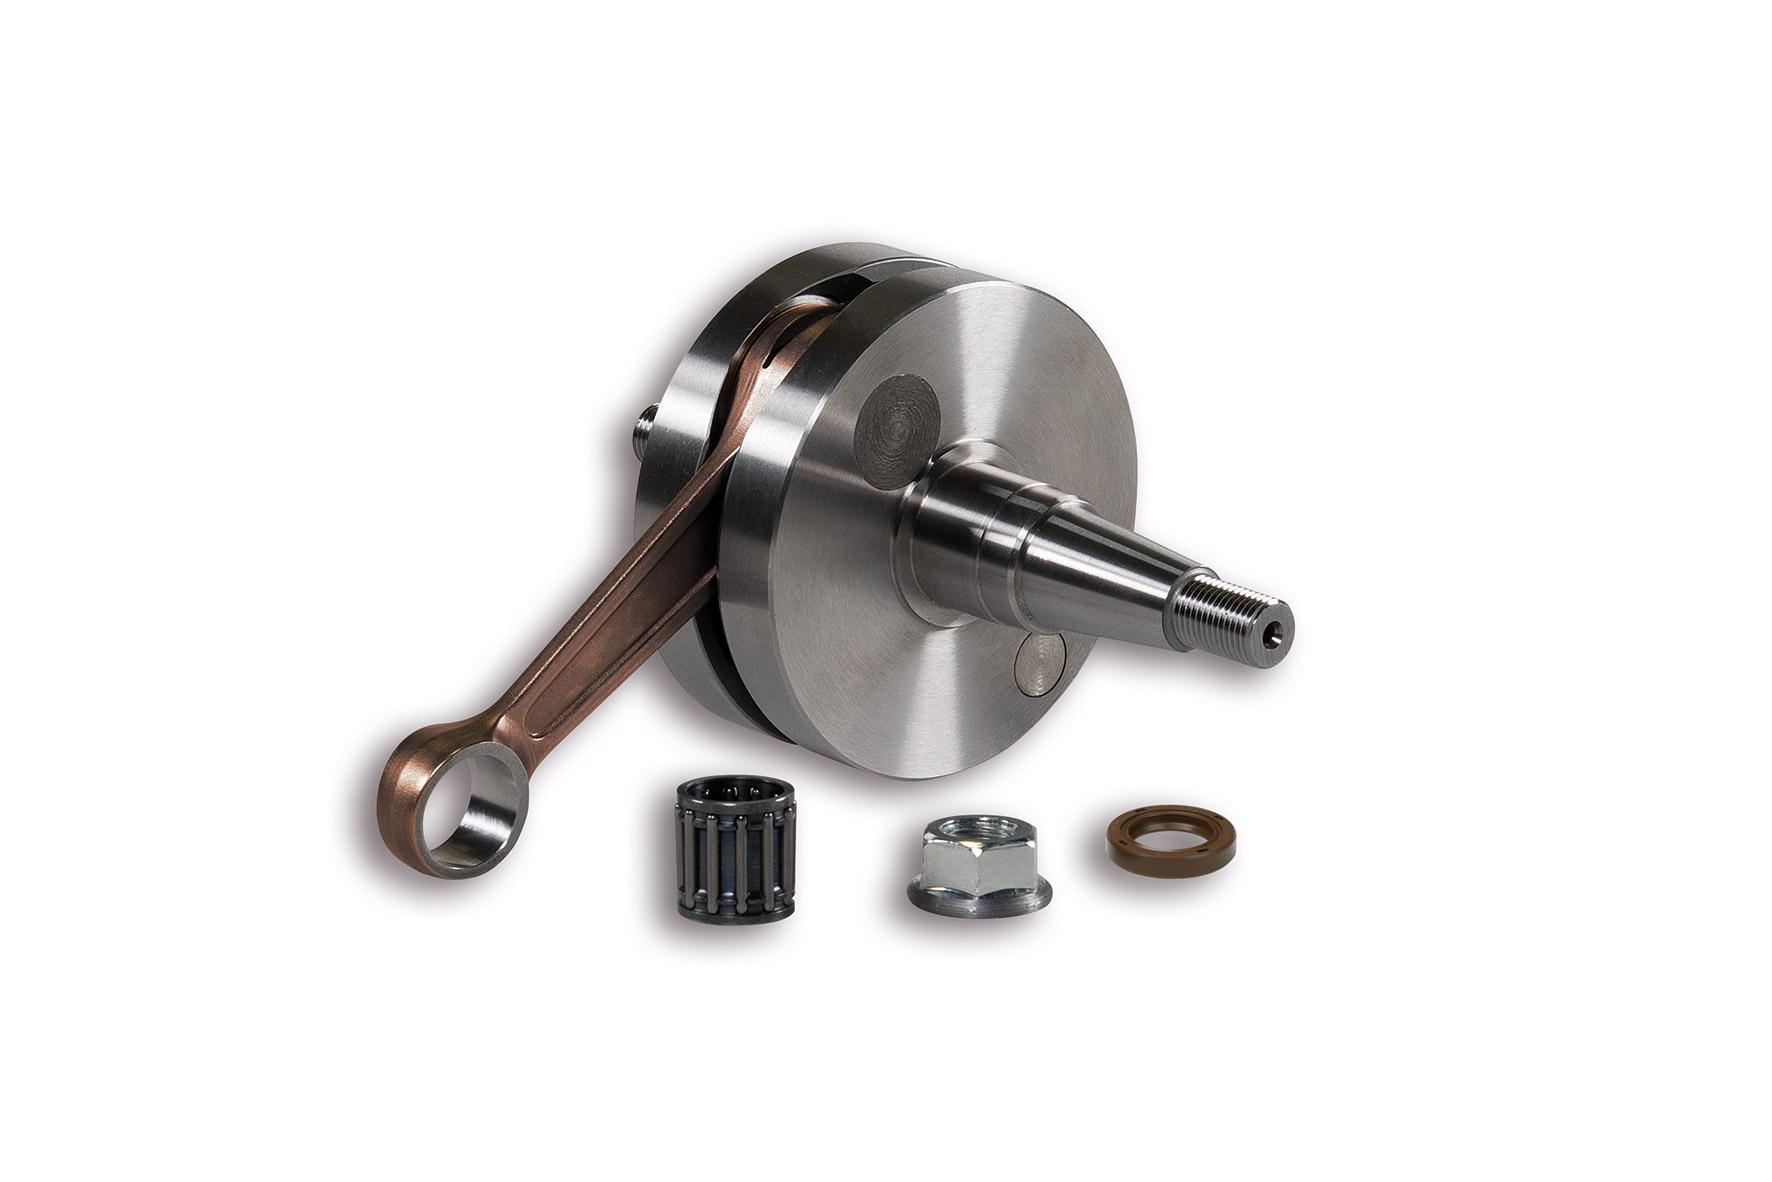 CRANKSHAFT pin Ø 15 rod 97 (stroke 51 mm) reed valve - cone Ø 20